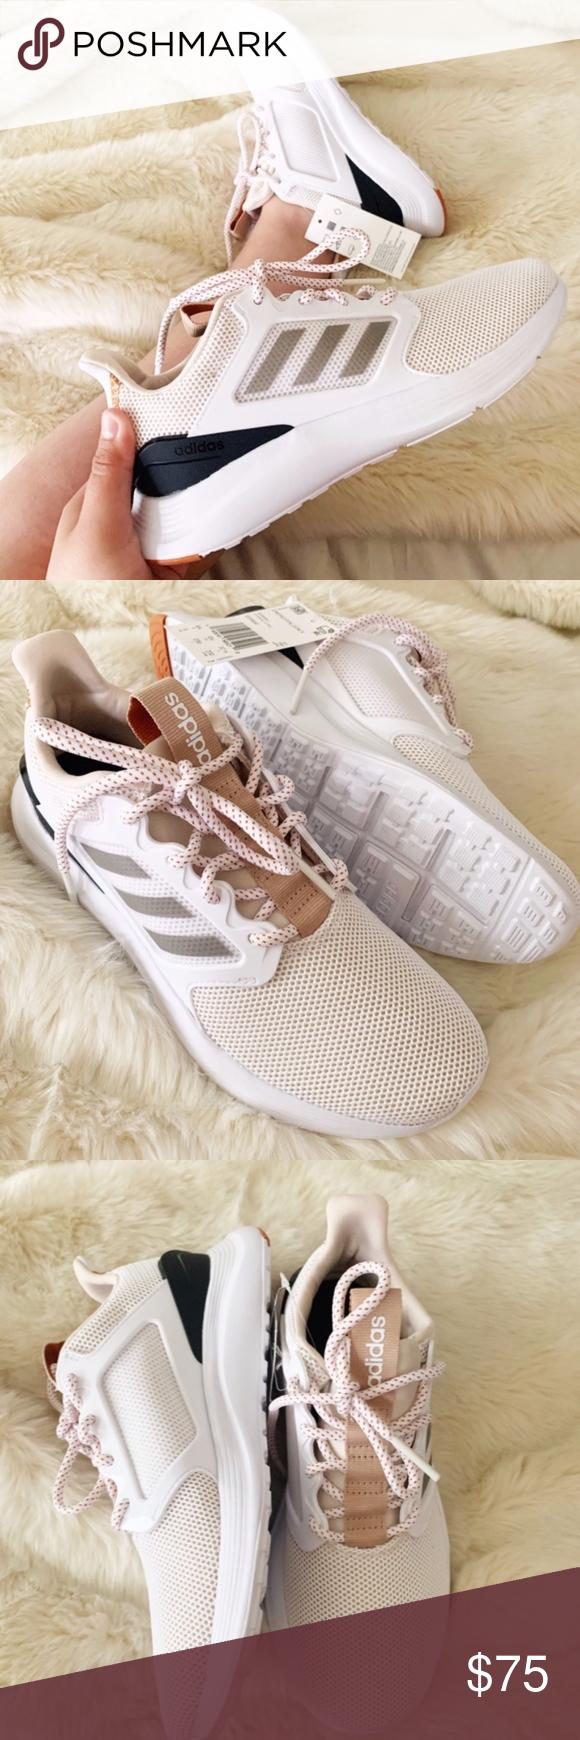 Kilómetros financiero variable  Adidas Energy Falcon Running Shoes   Shoes sneakers adidas, Adidas shoes,  Shoes